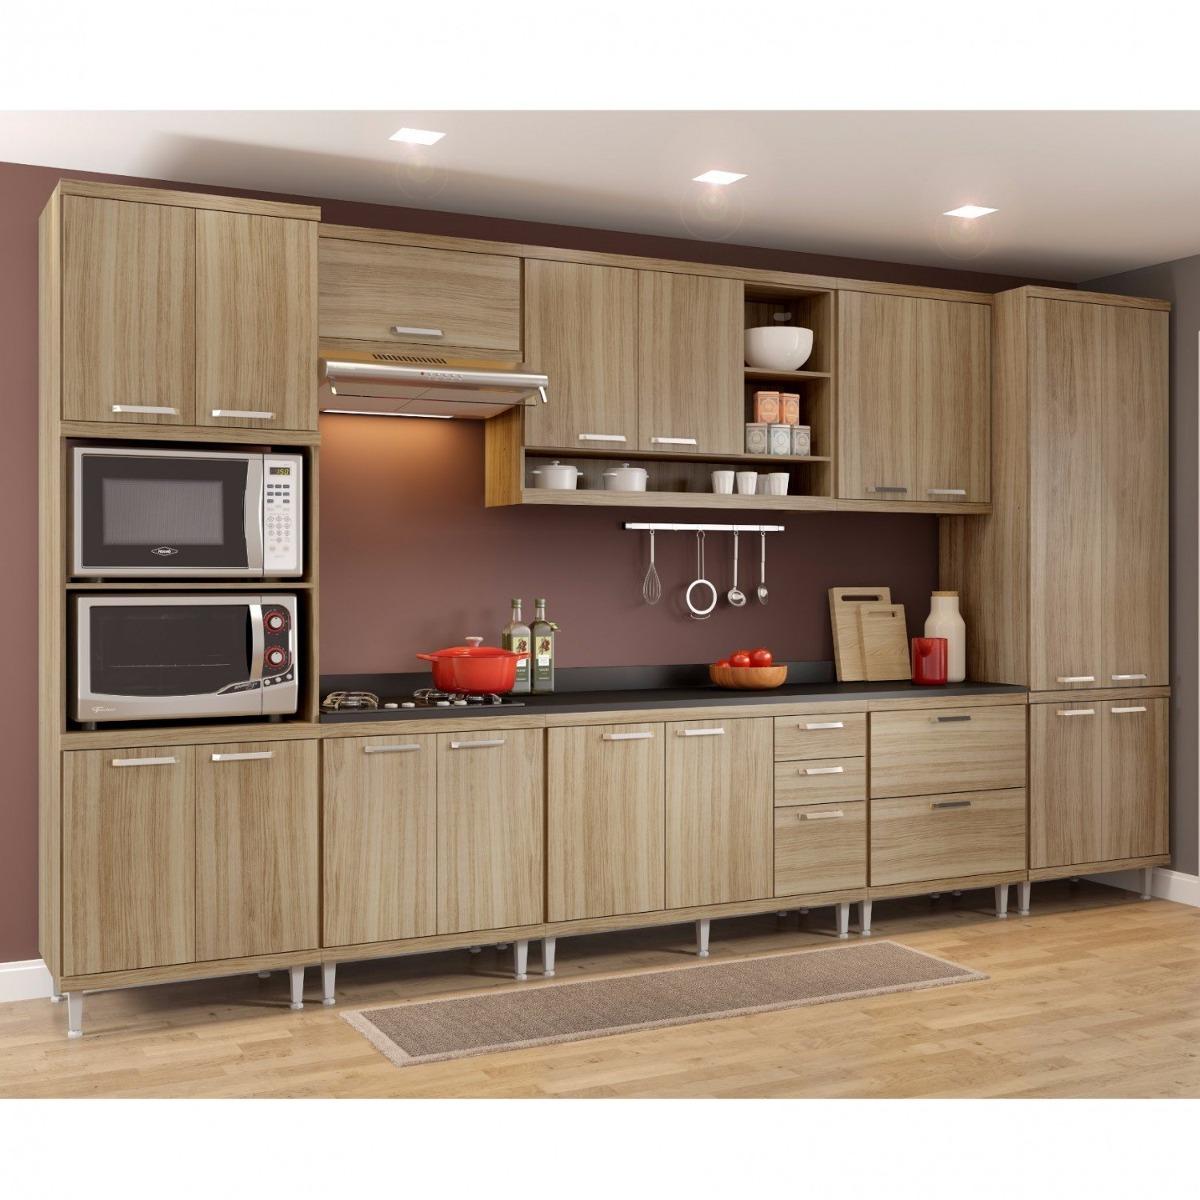 Cozinha Completa 9 Pe As Sic Lia S16t Multim Veis Ge R 3 099 90